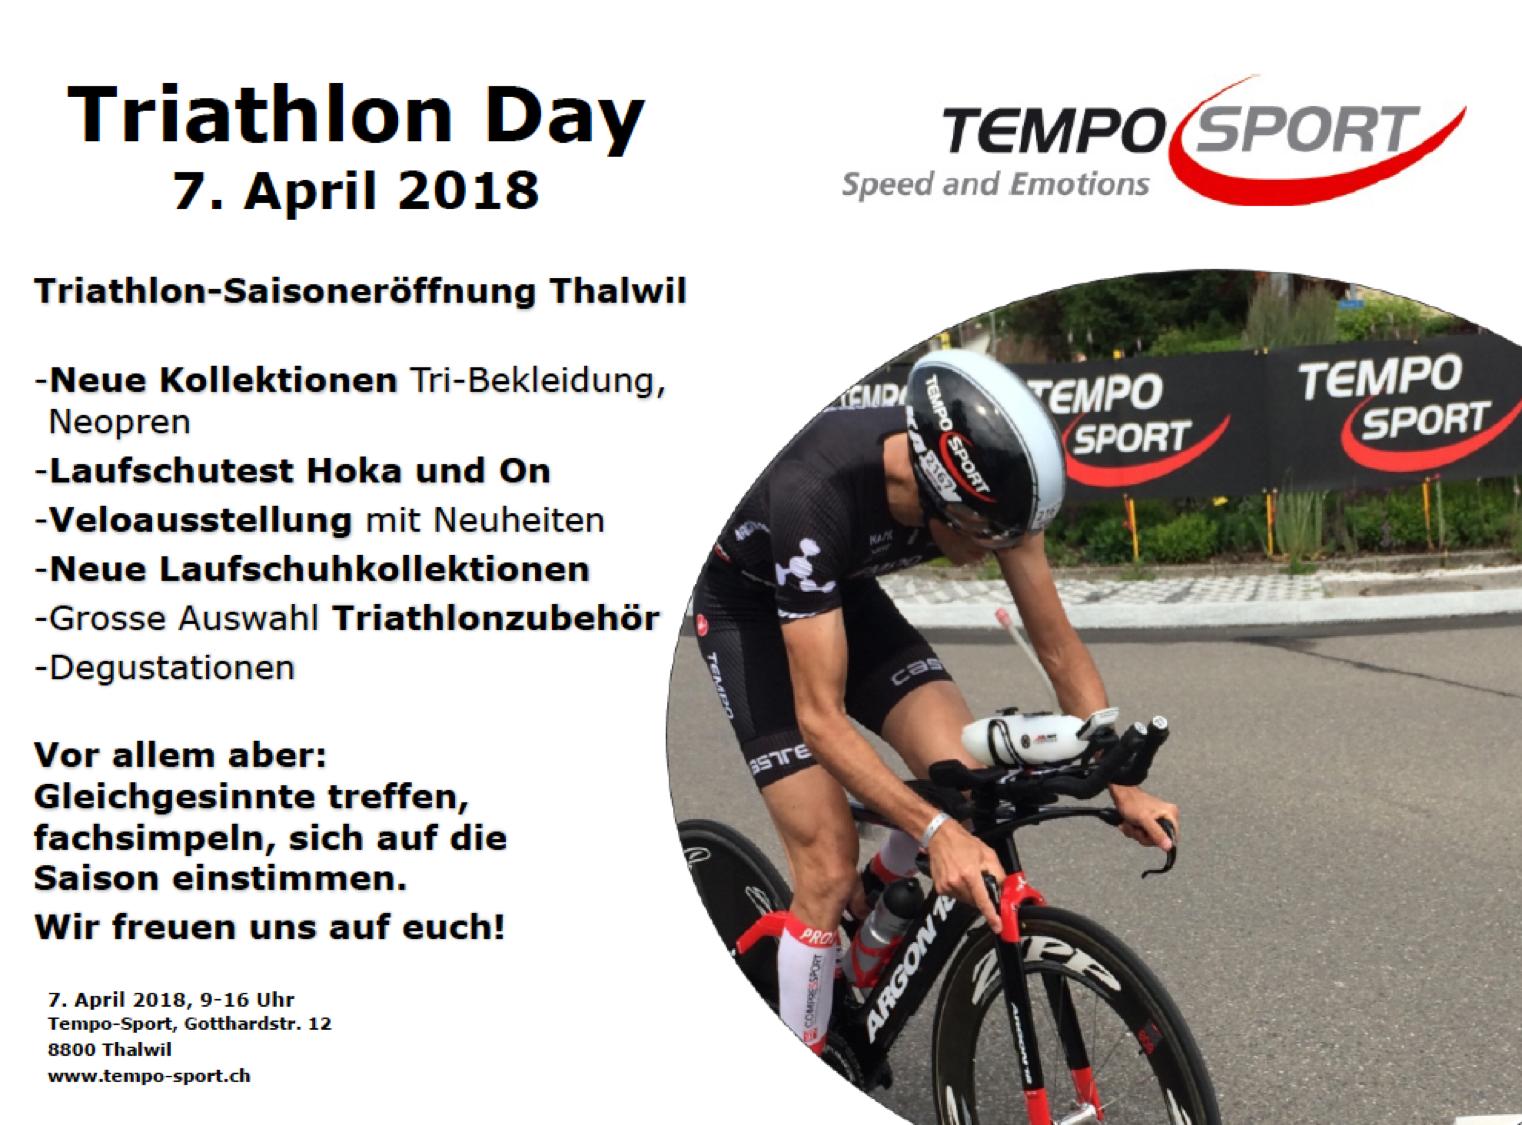 Triathlon Day Thalwil 7. April 2018